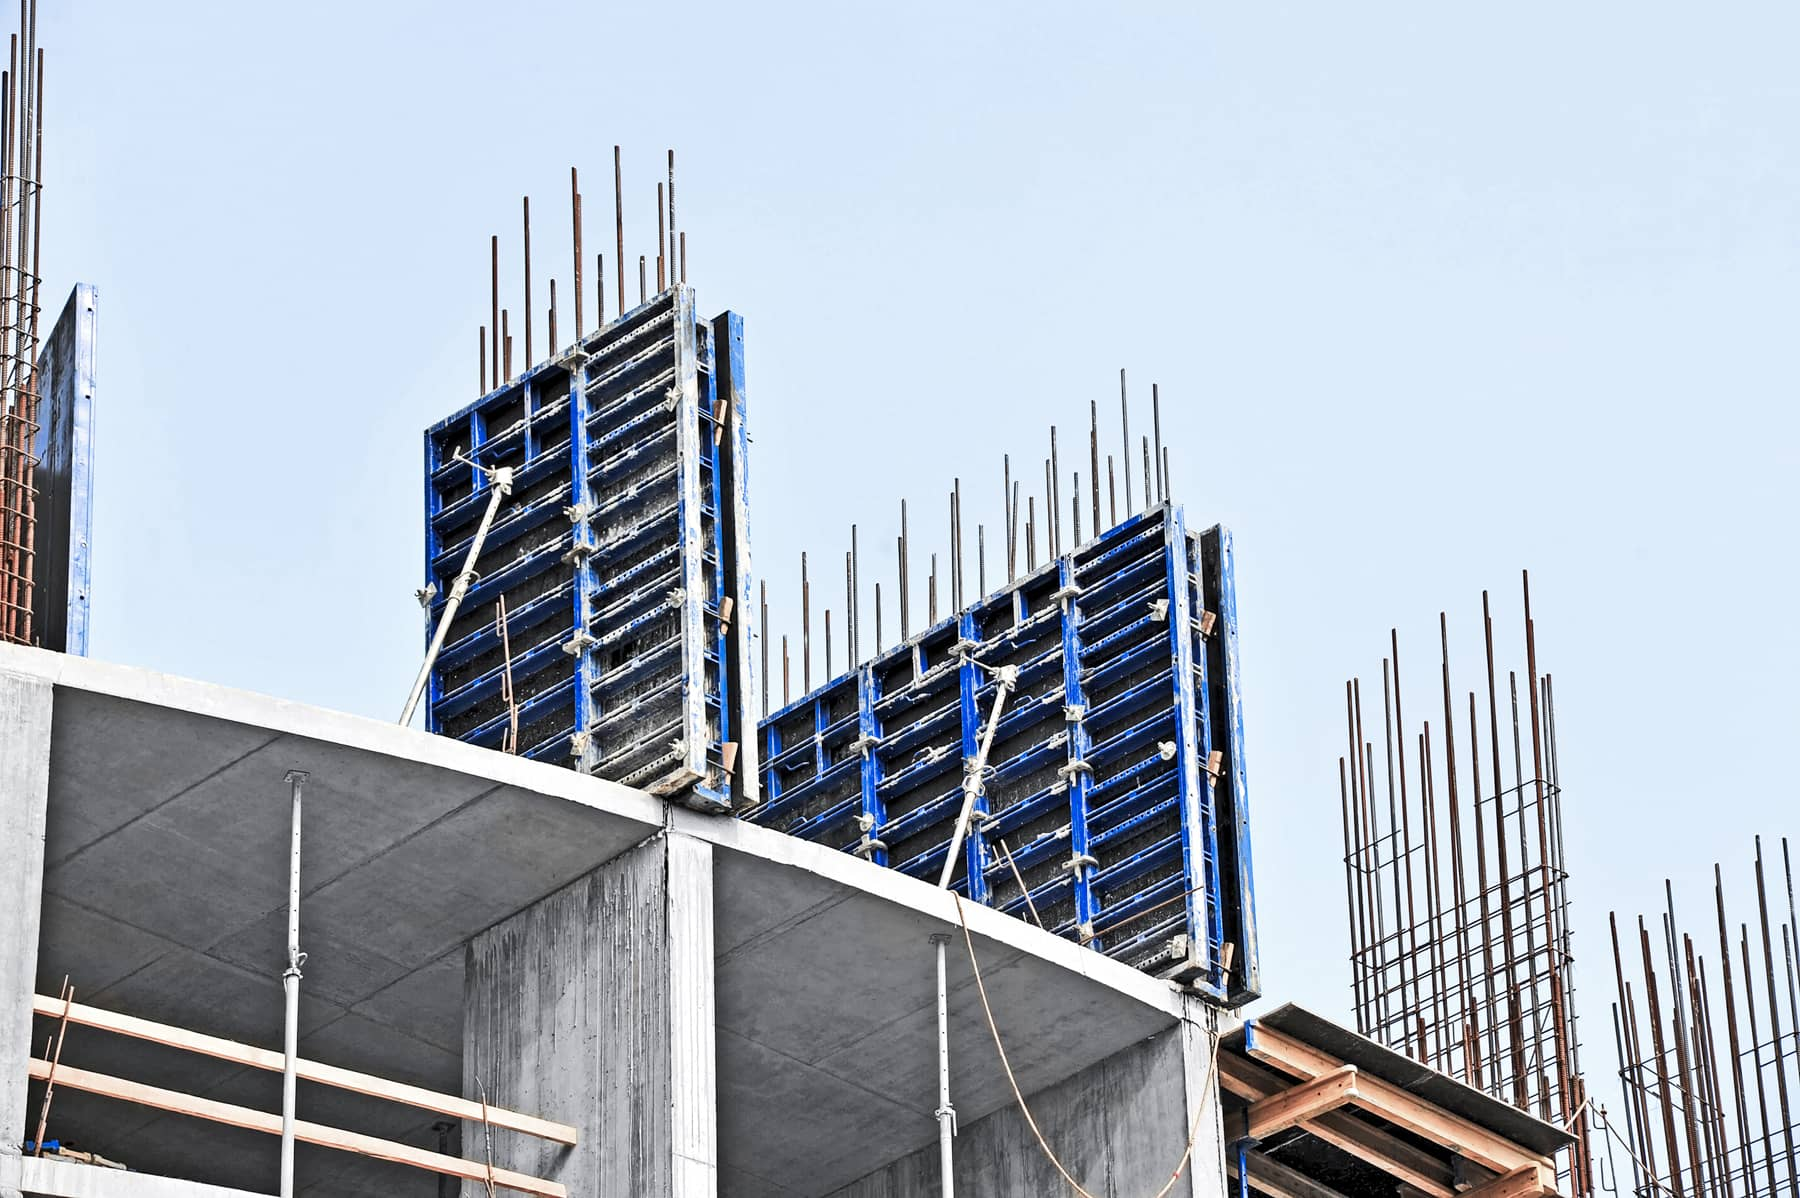 Ingenieurbüro Nebel - Statik - Architekten - Ingenieurleistungen - Baustatik